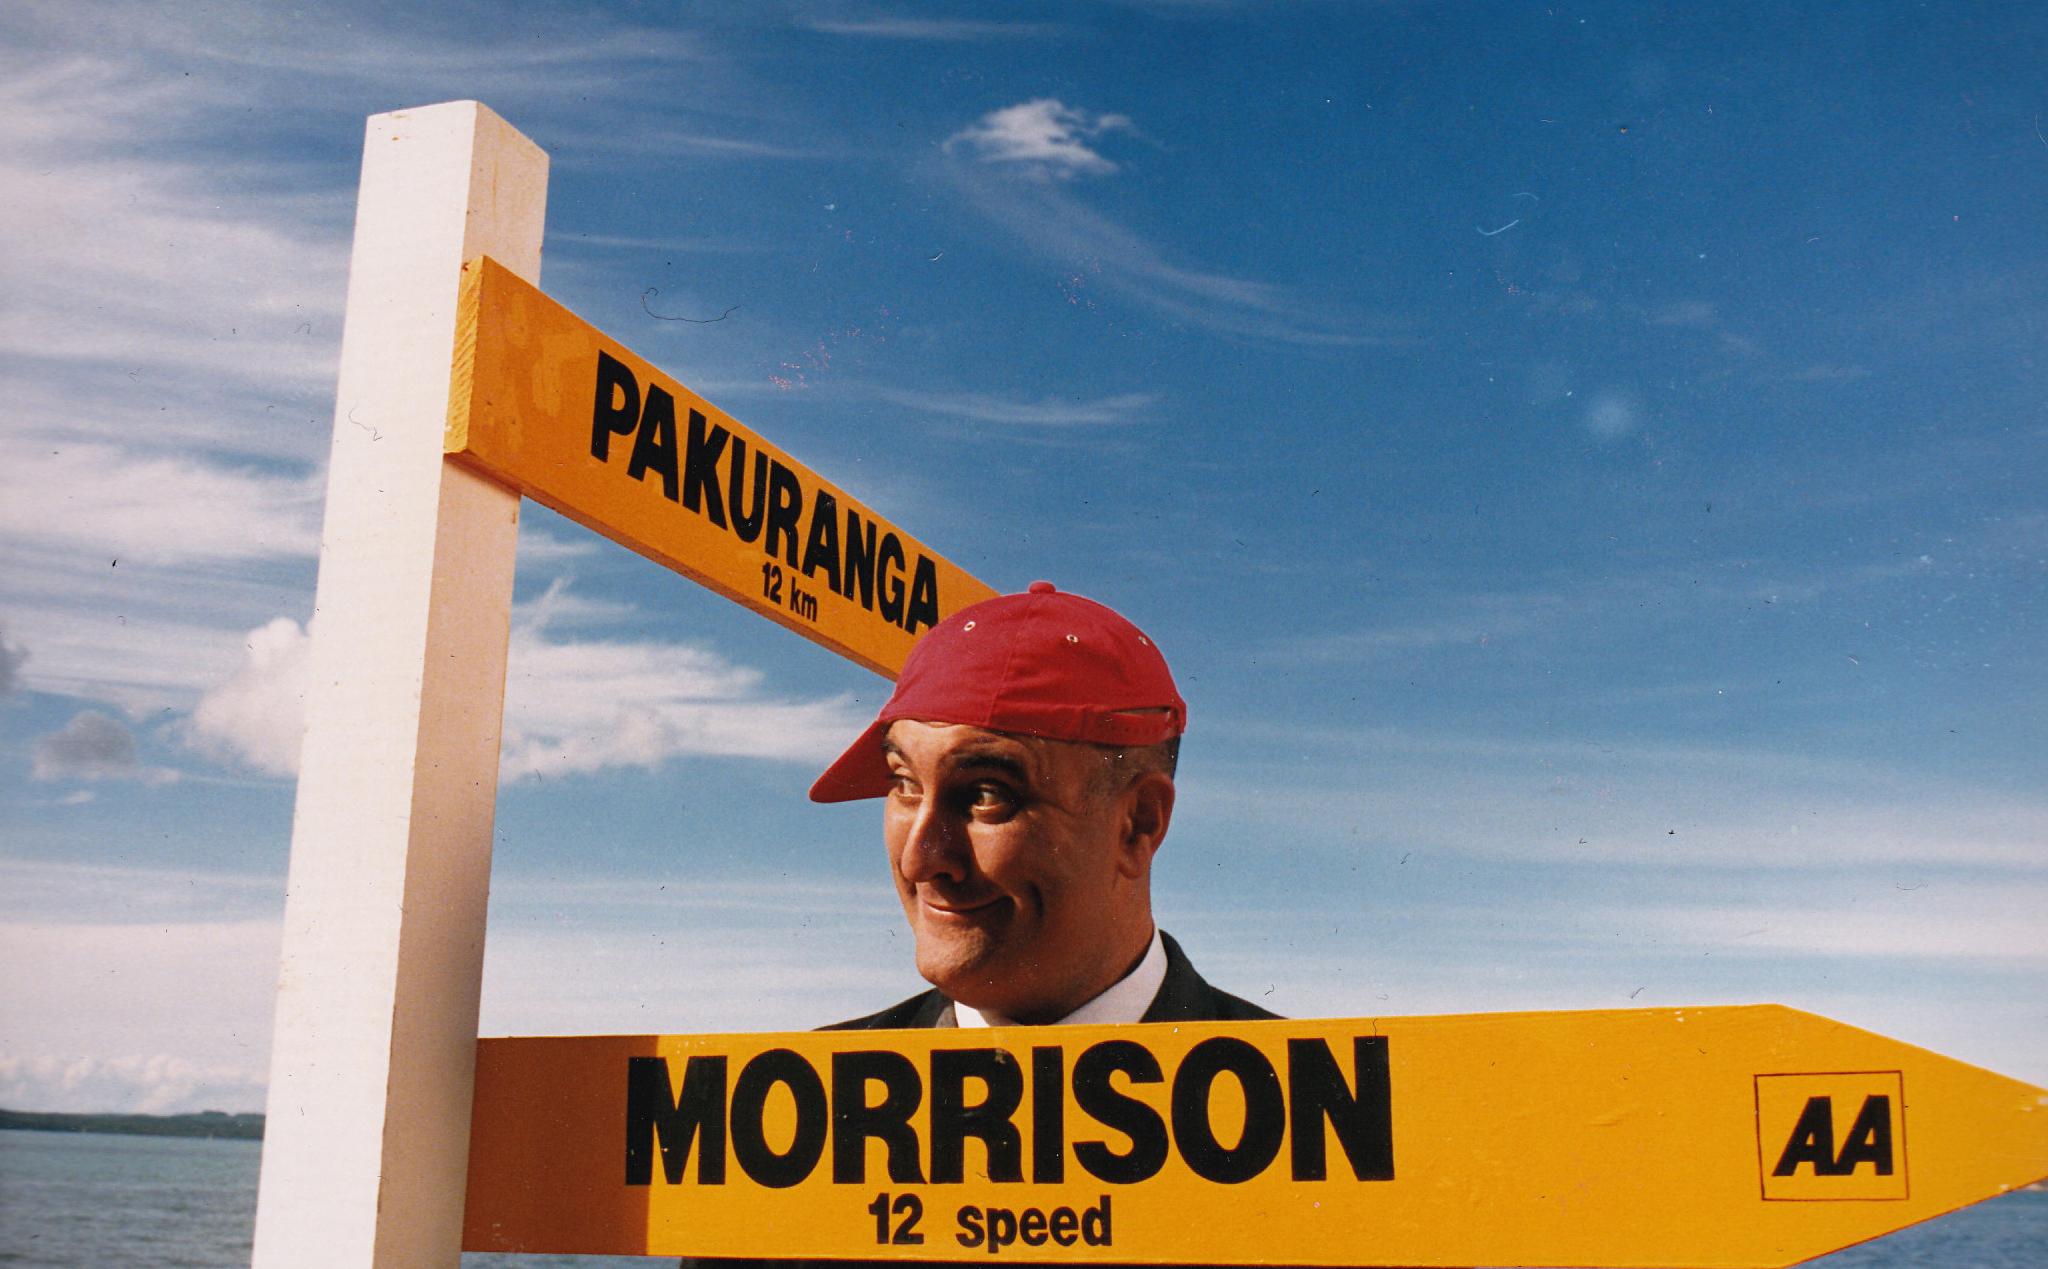 Morrison Cycles - Alexi Sayle